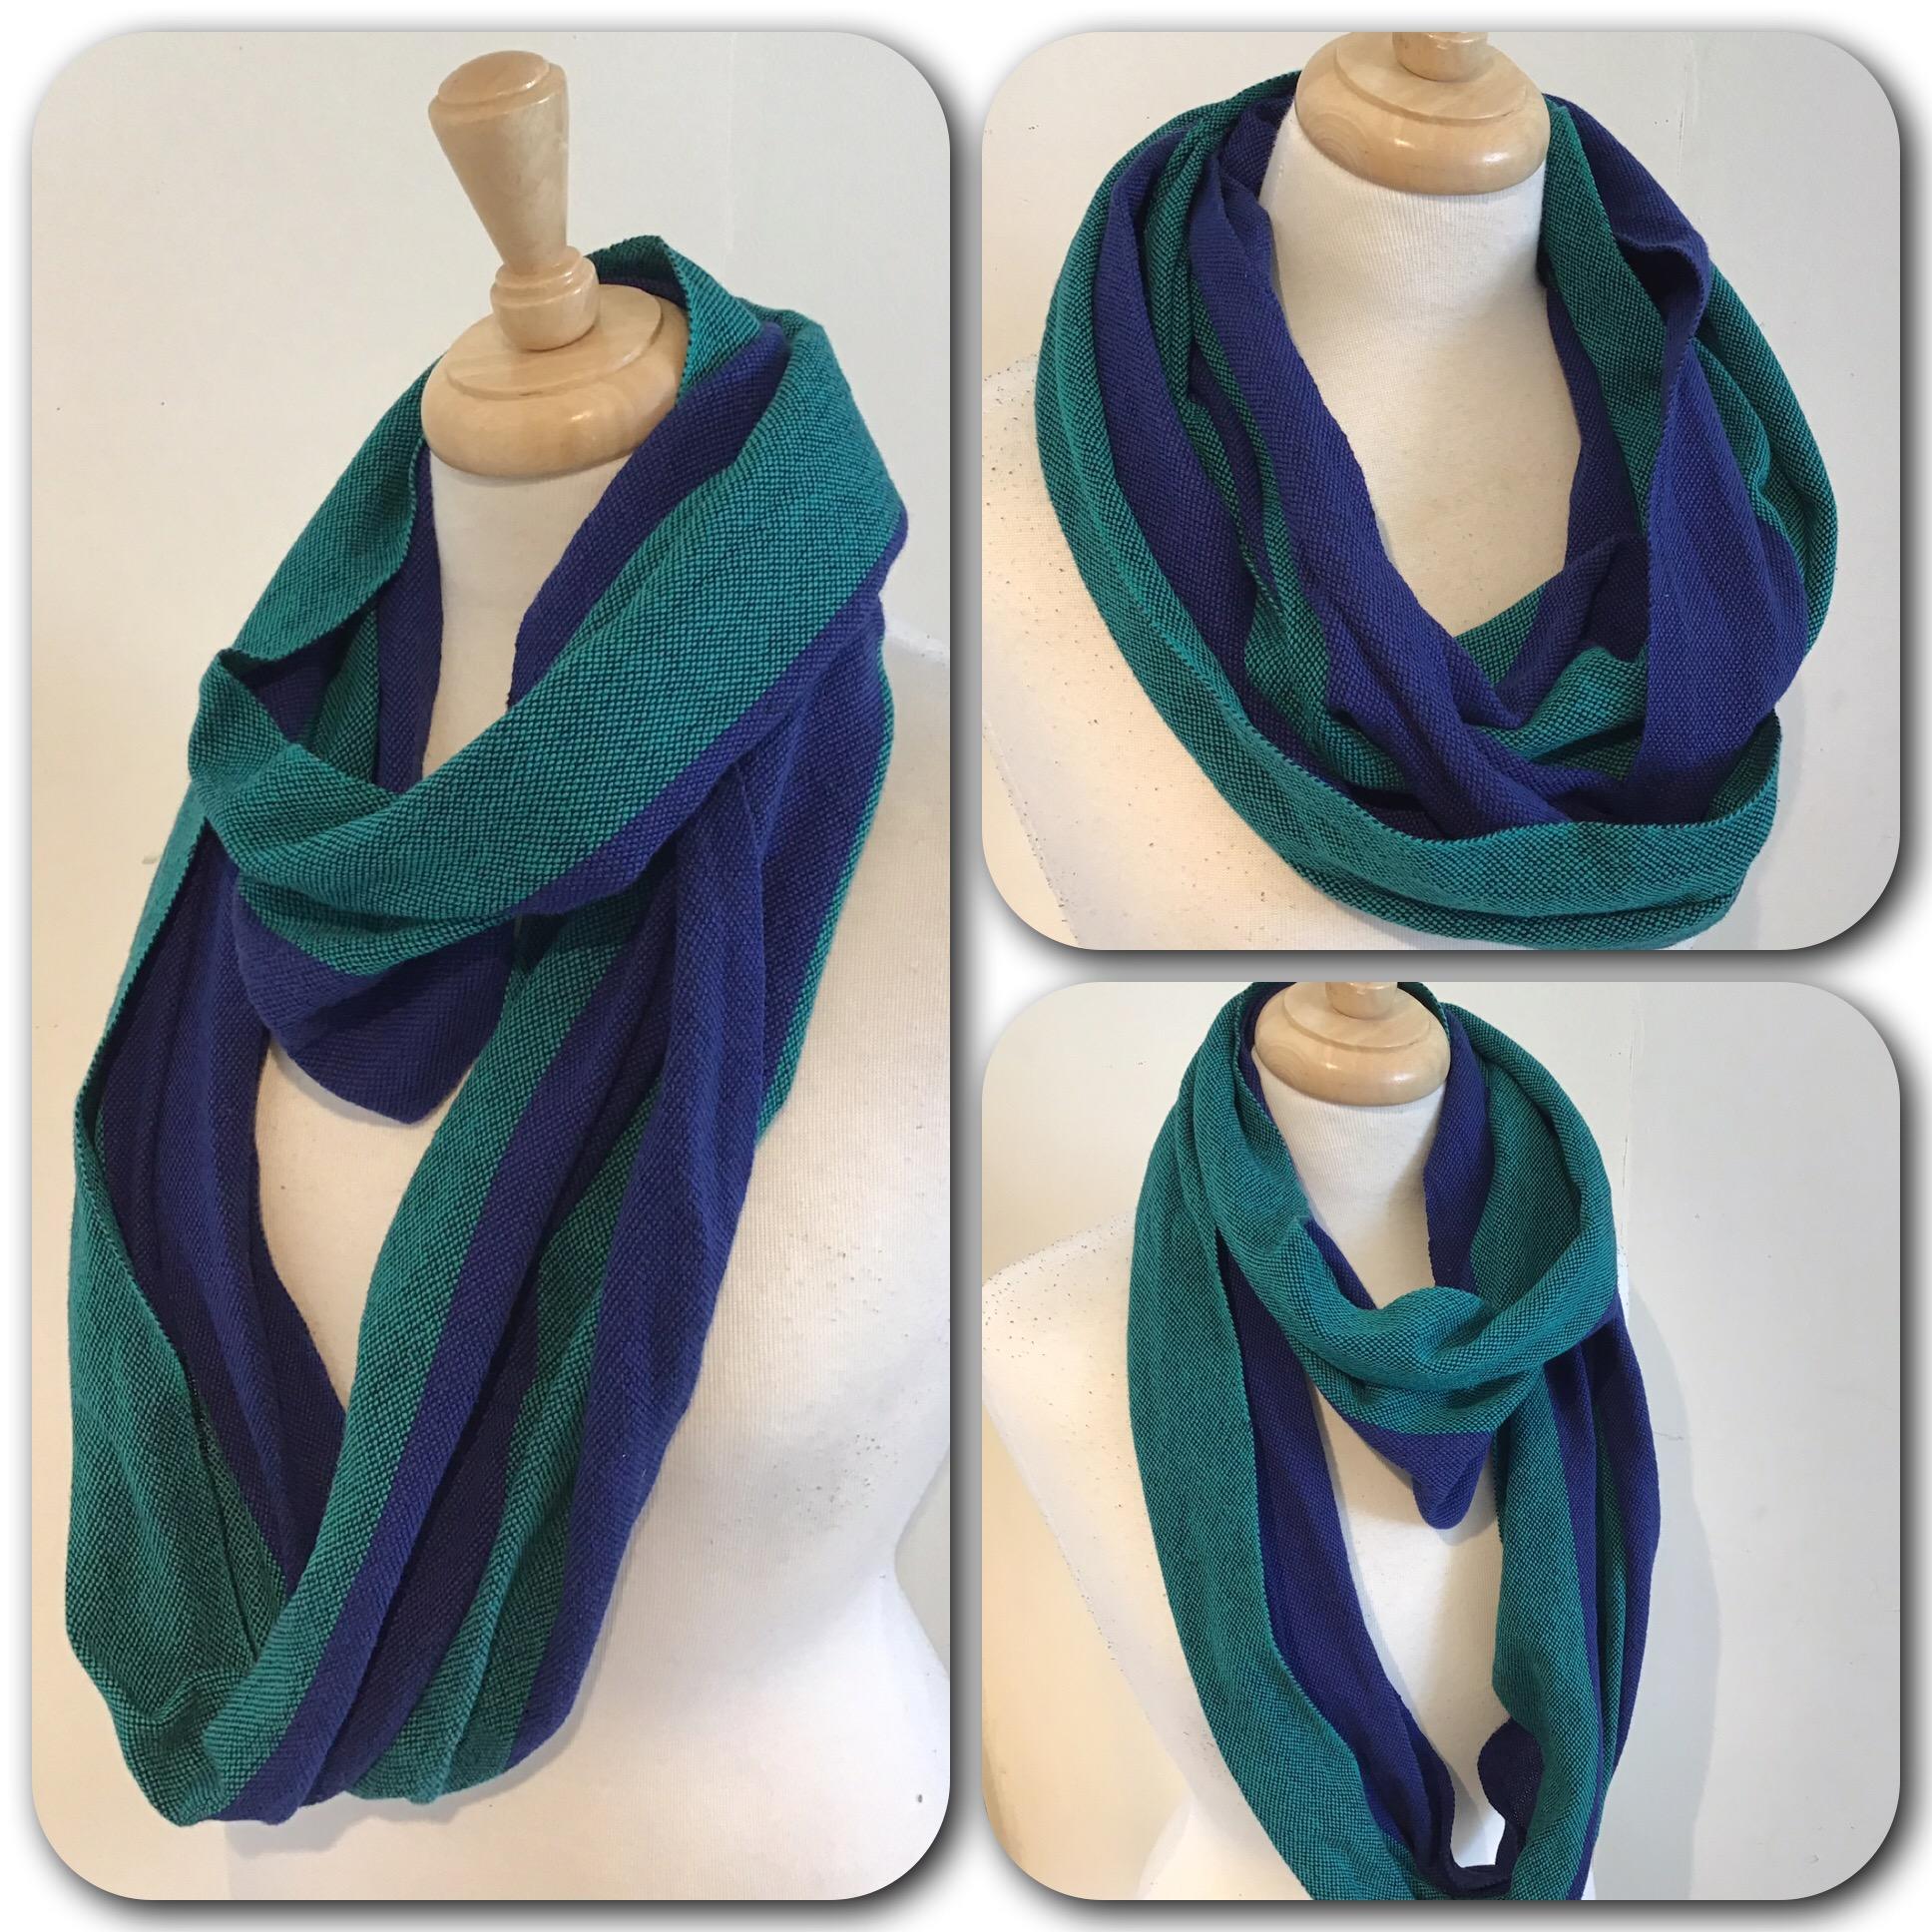 Handwoven double loop infinity scarf